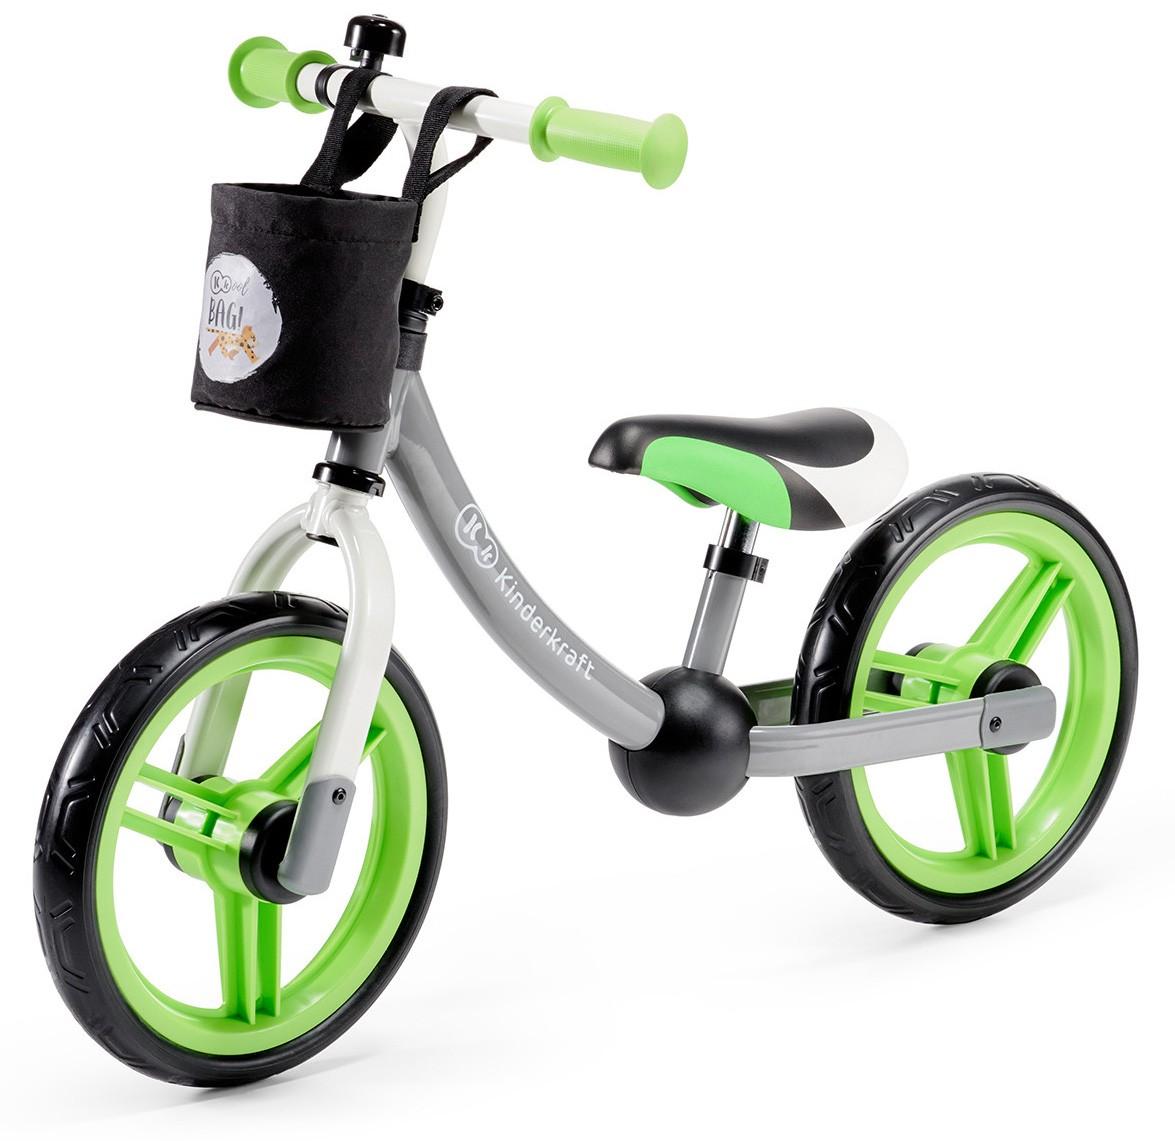 Bici 2Way Next Kinderkraft Gray/Green